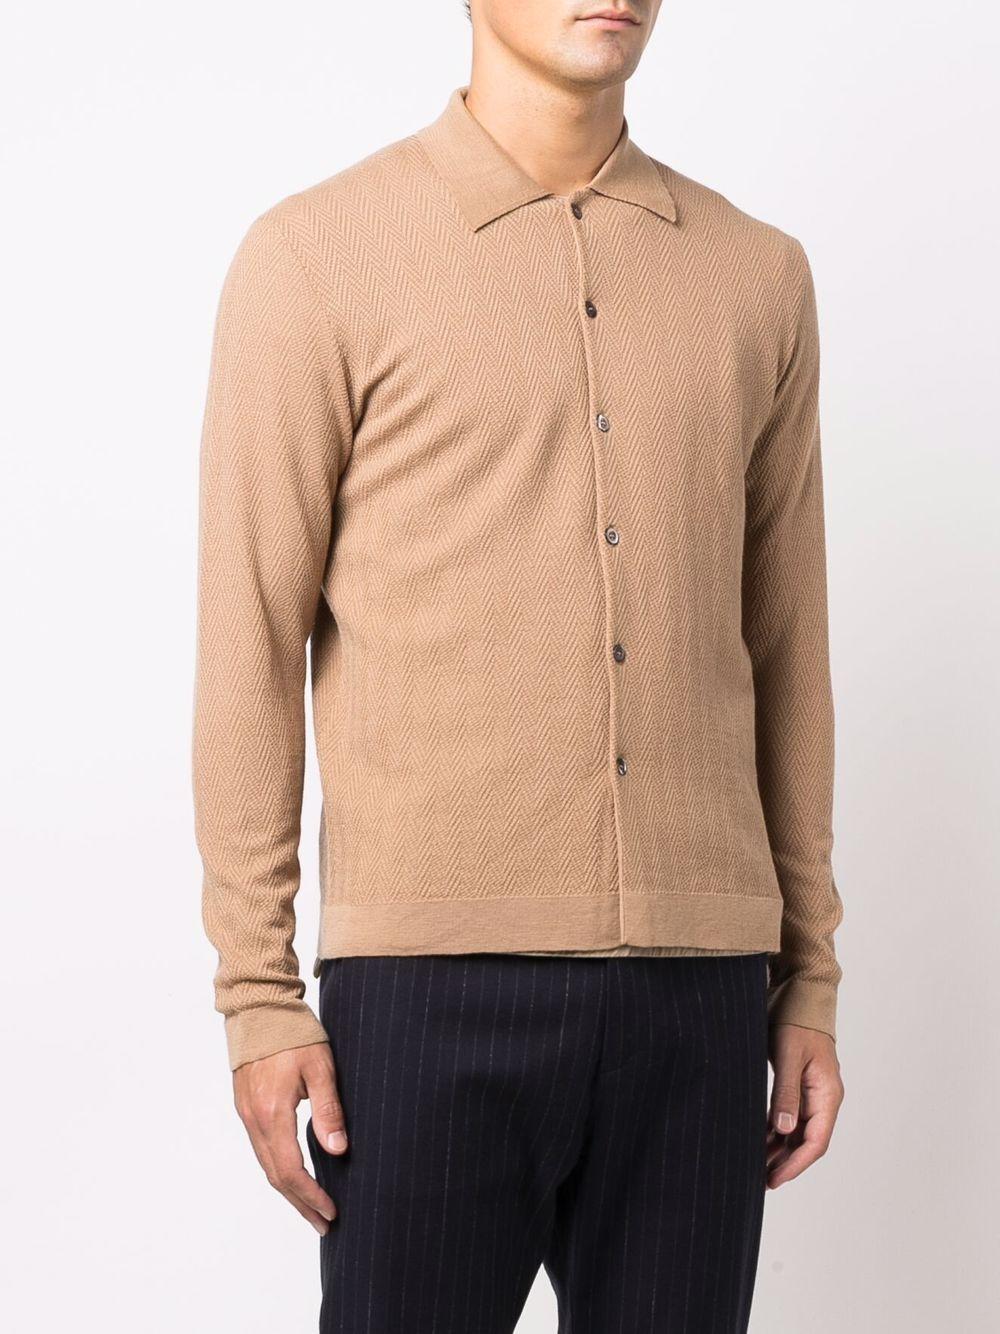 Cardigan beige in lana vergine con lavorazione a spina di pesce ALTEA | Cardigan | 216111734